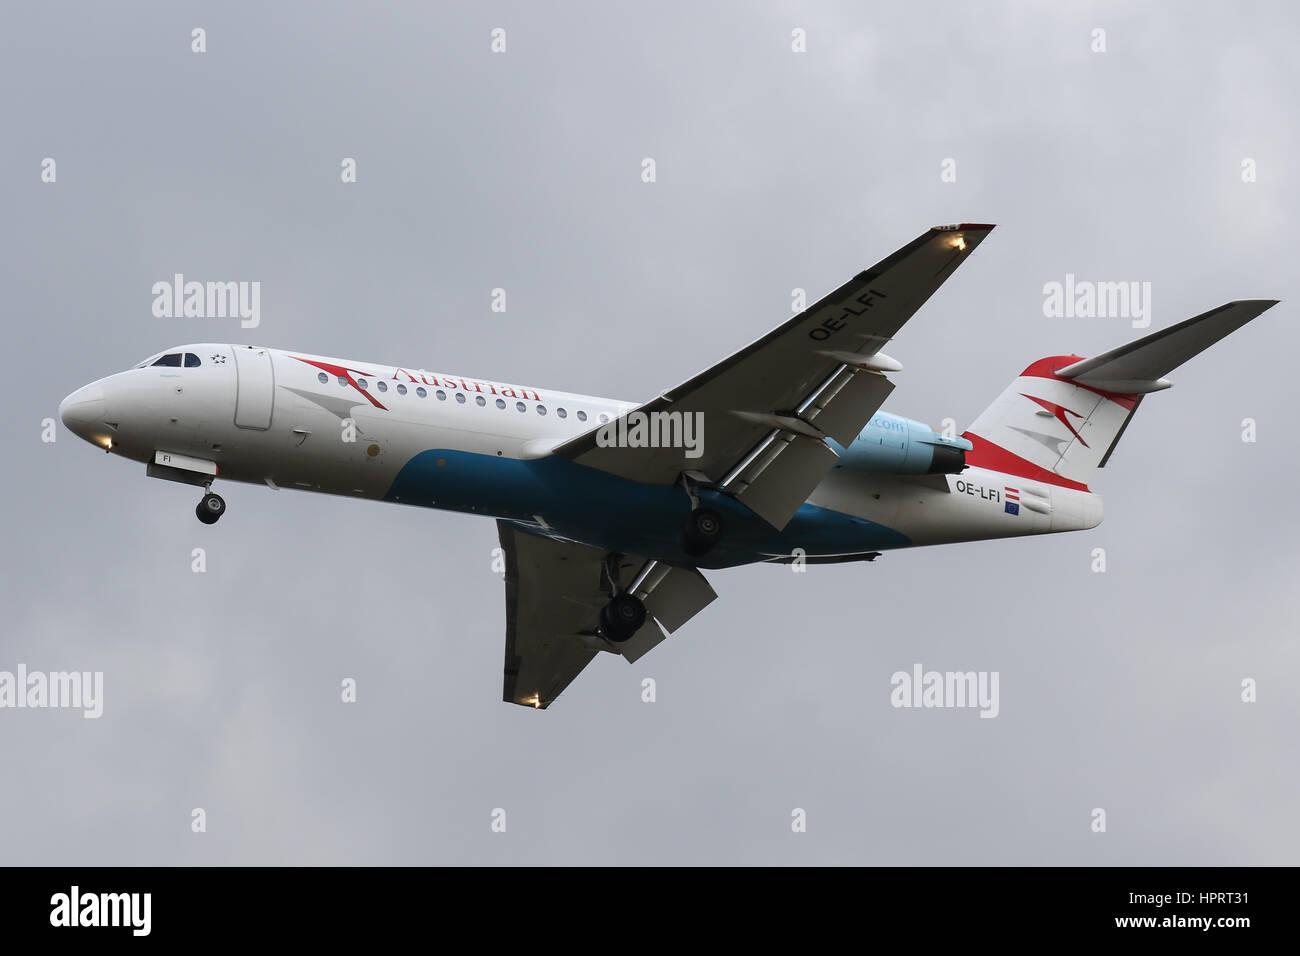 Austrian Airlines Fokker 70 OE-LFI landing at Southampton Airport - Stock Image